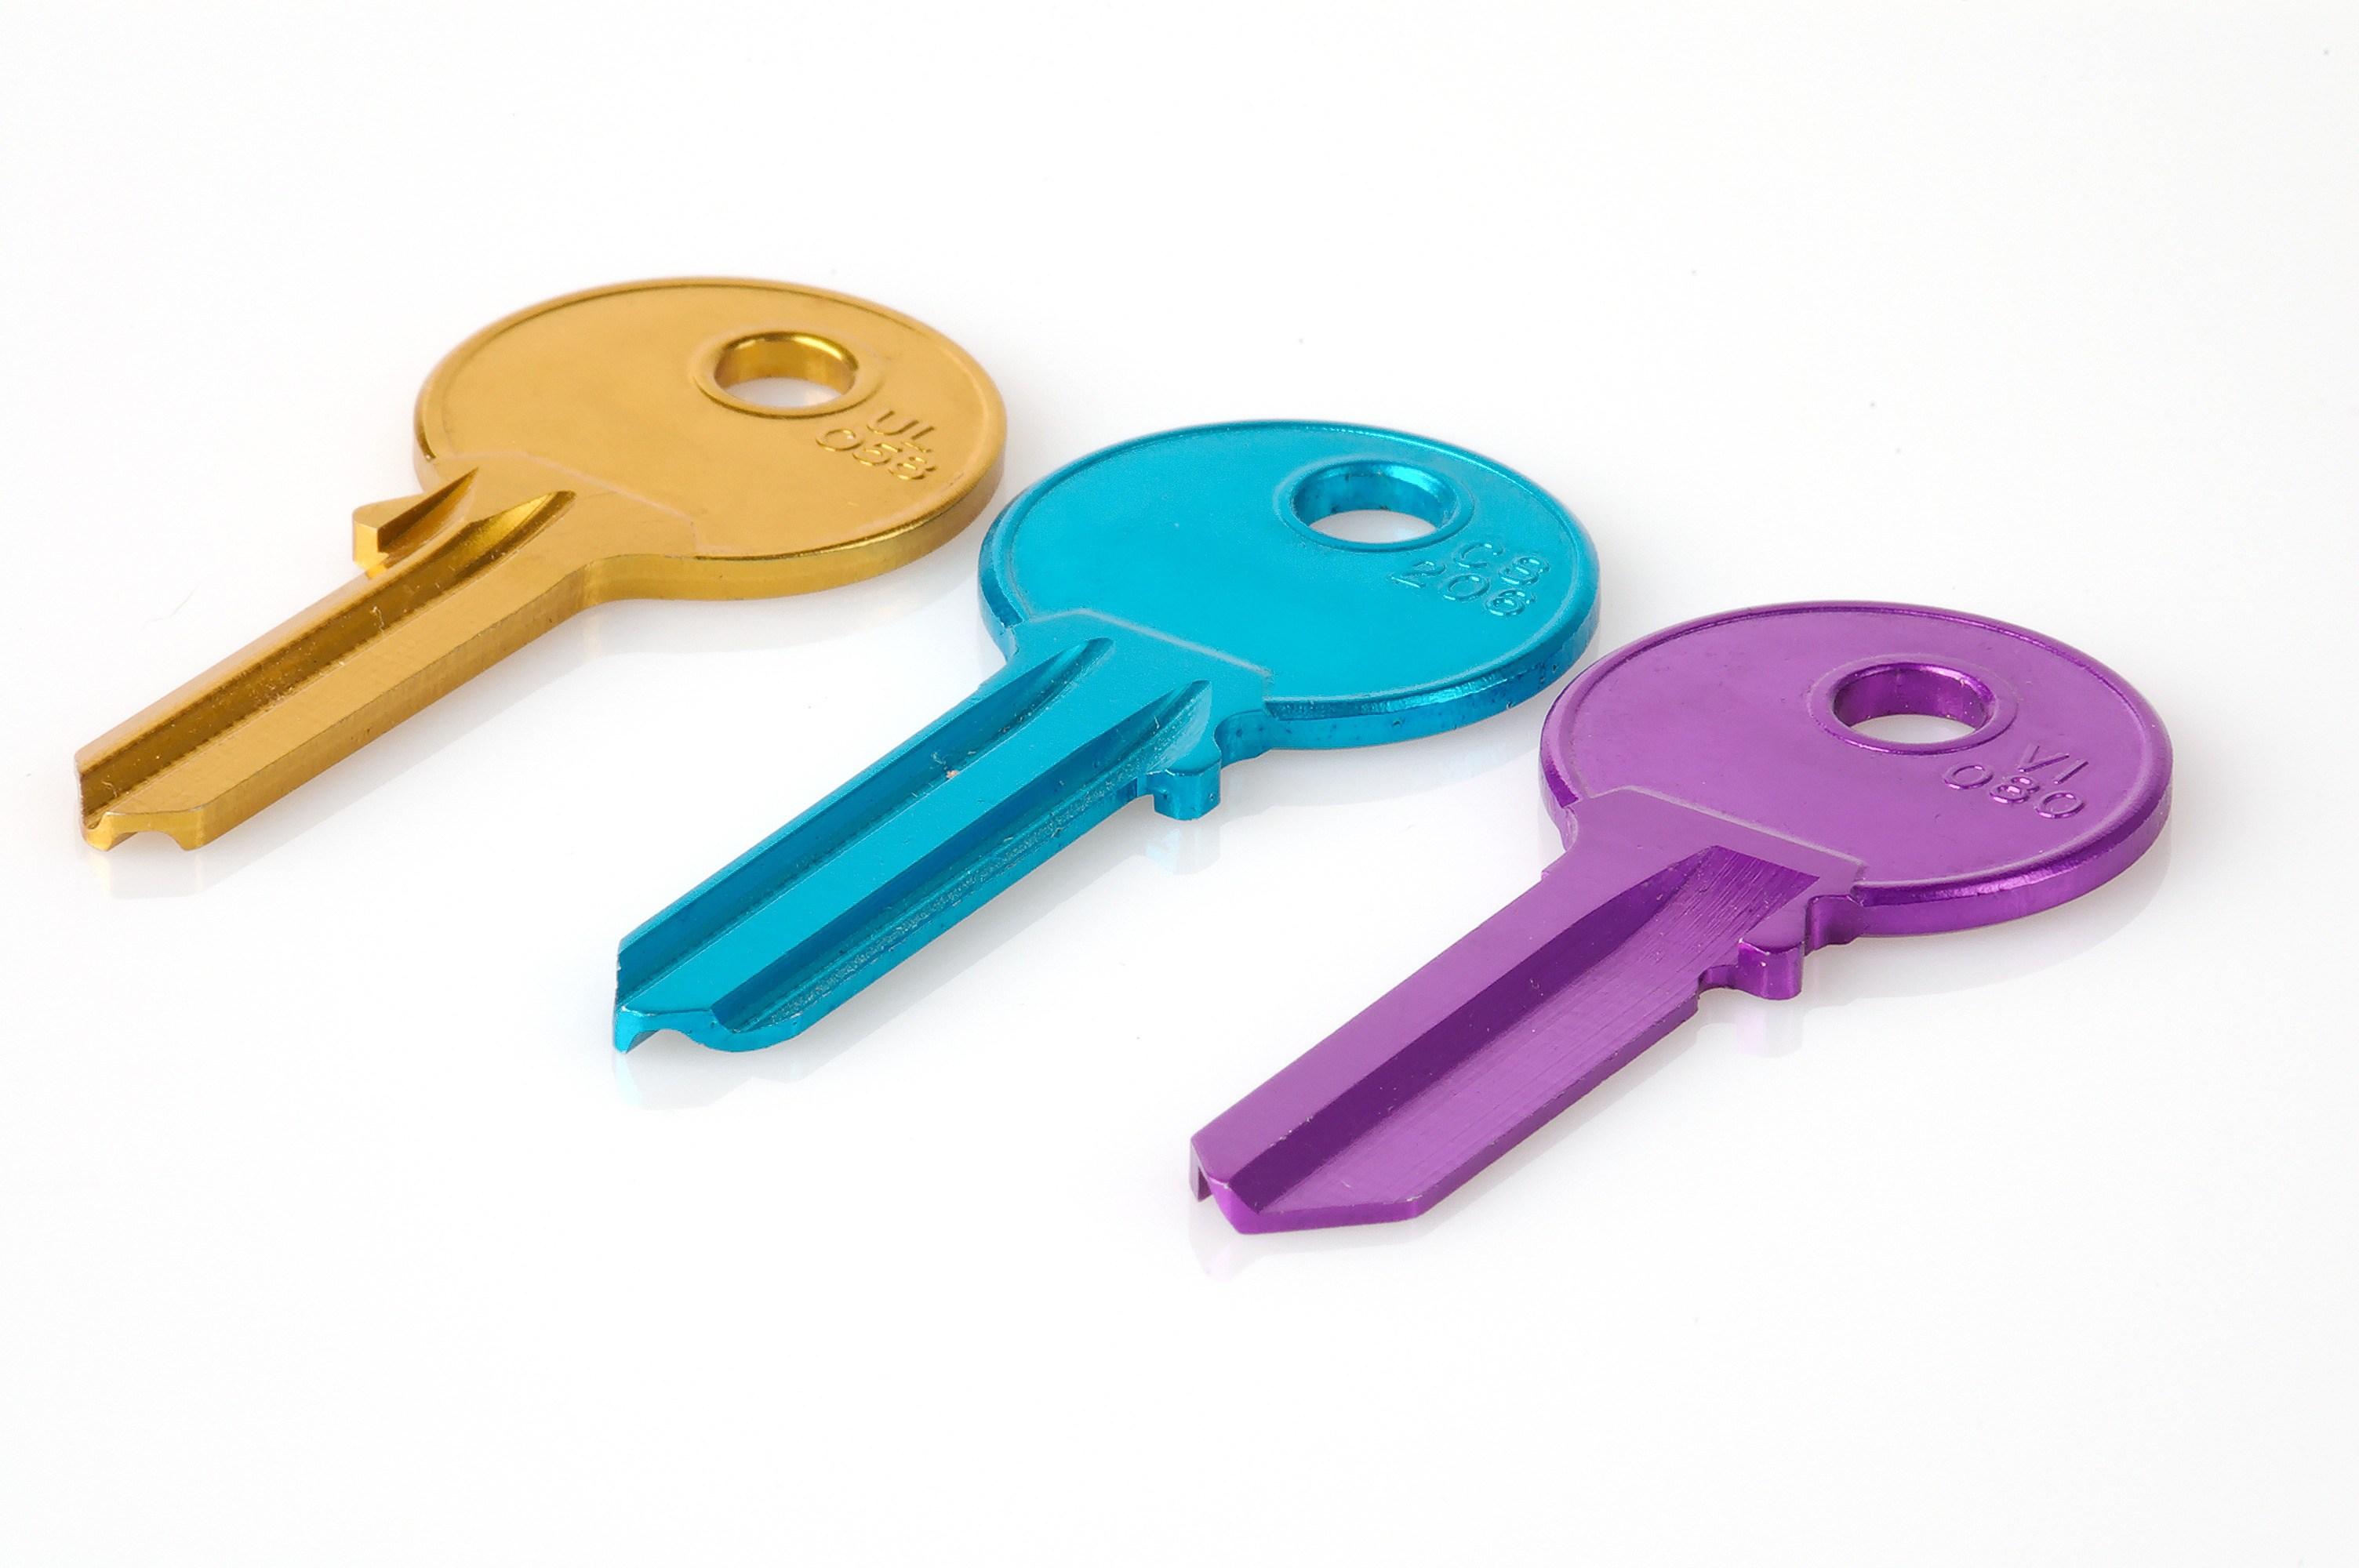 3008x2000 Images Of Keys Images Hd Download